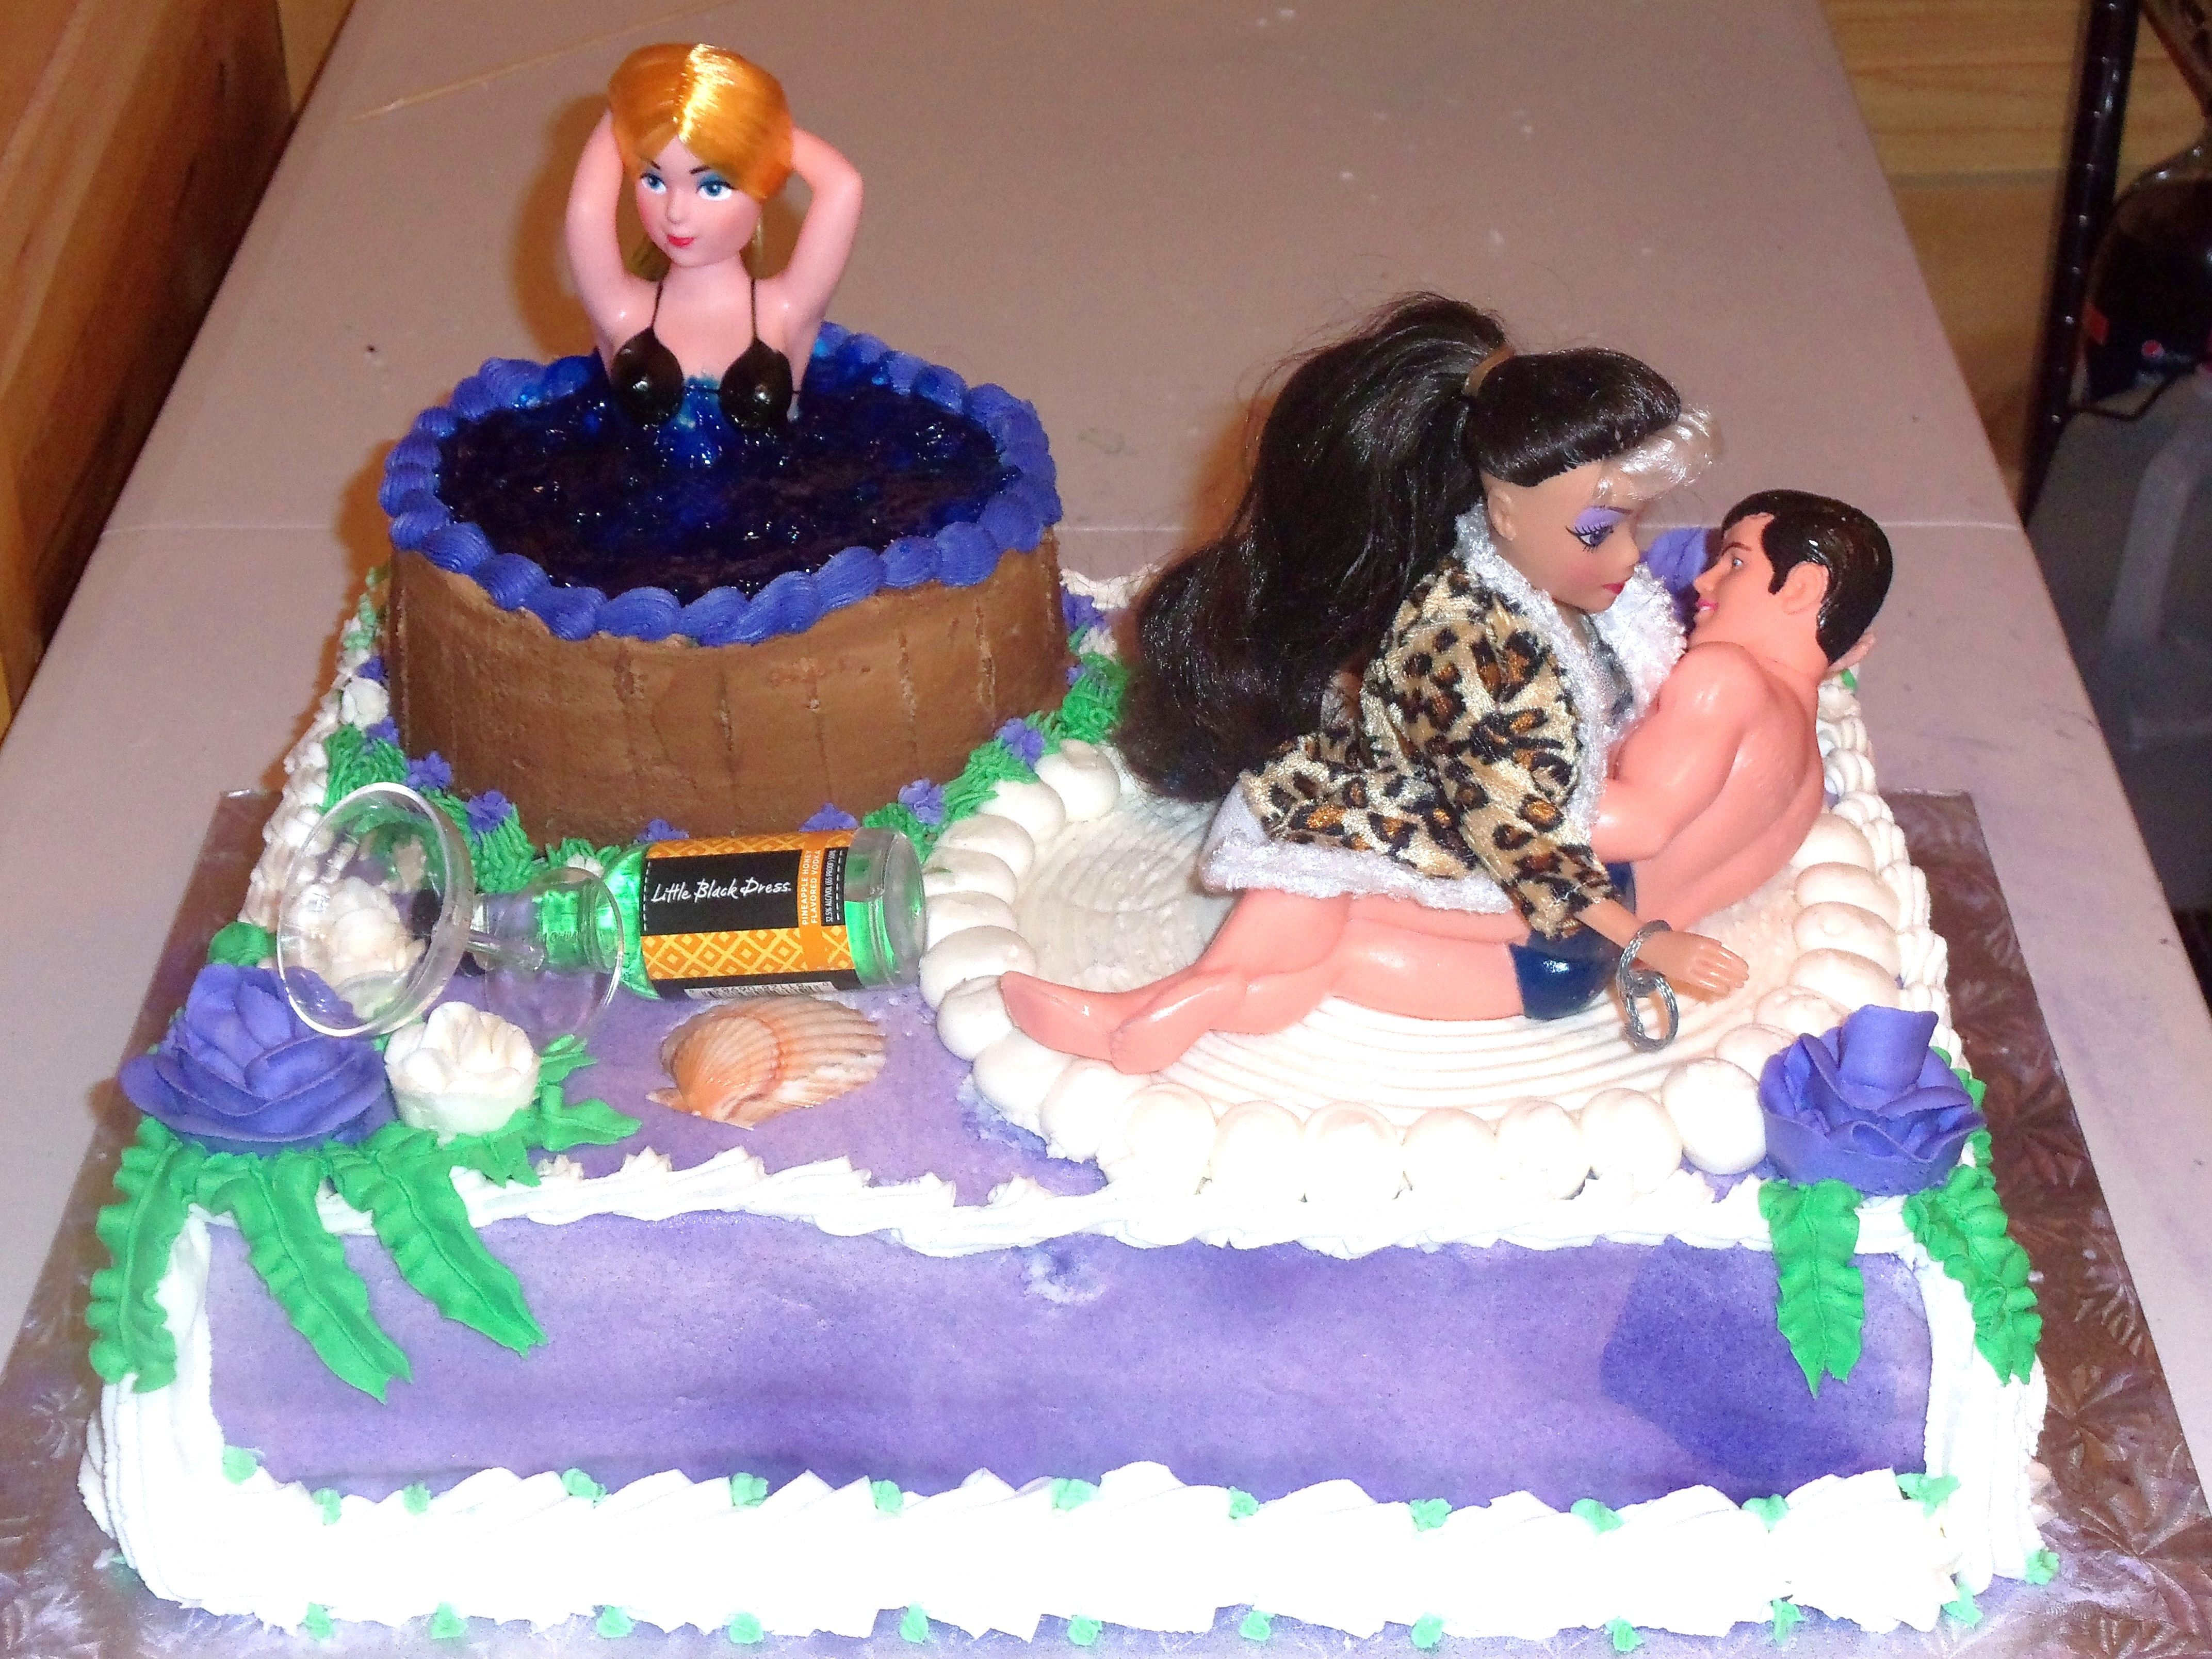 Fun Party Cake